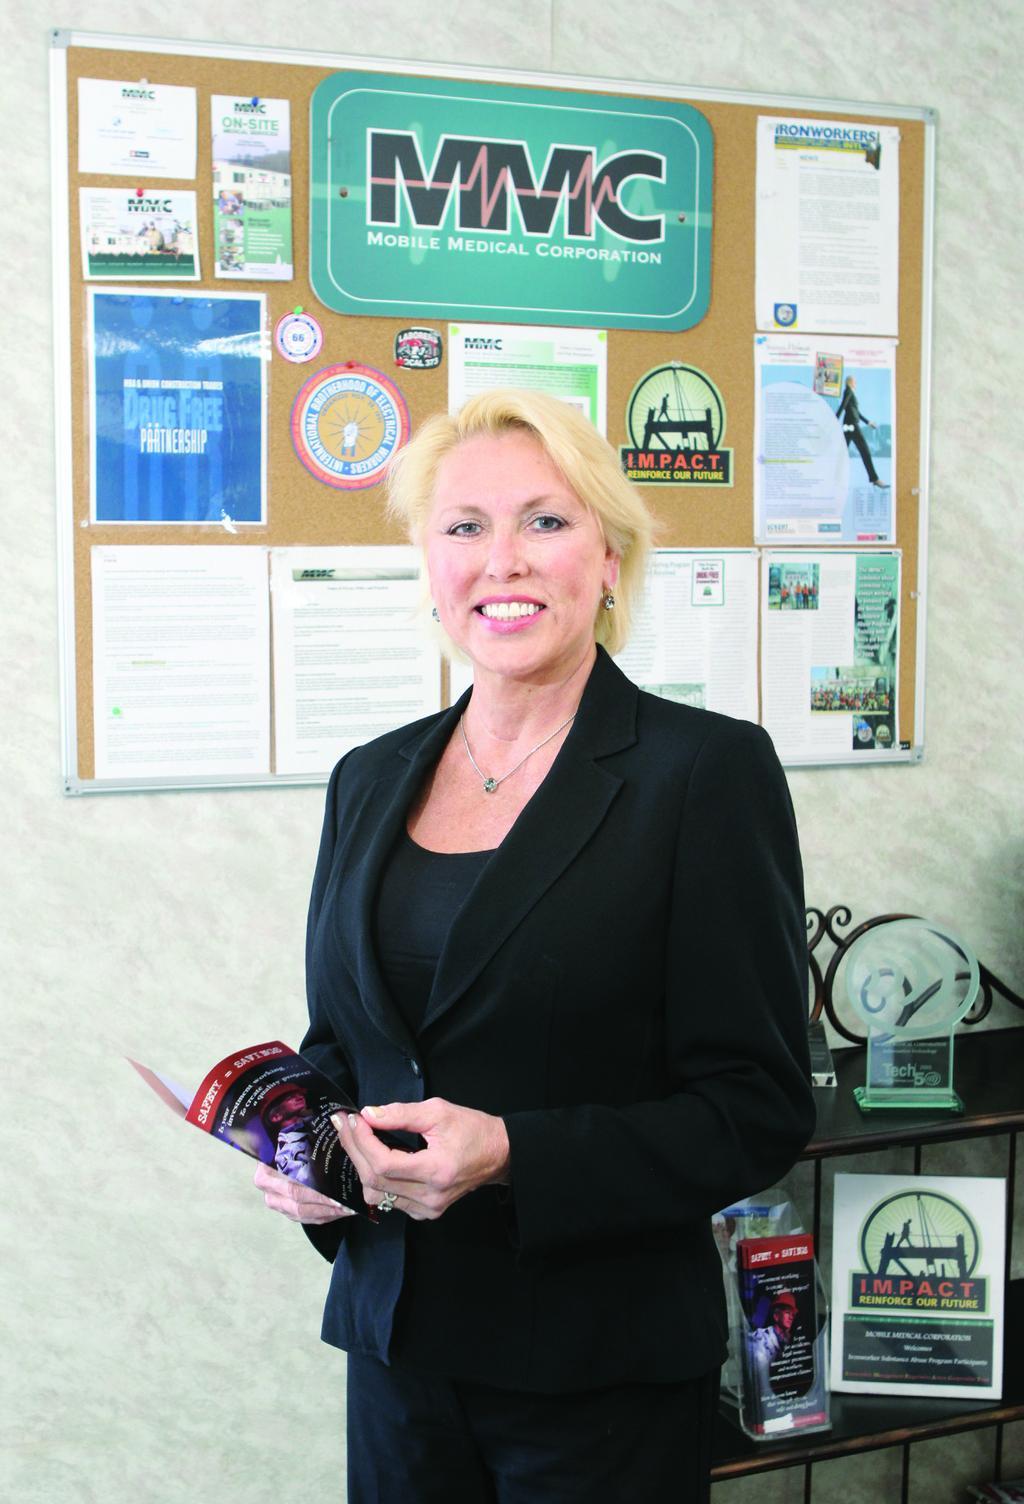 Cynthia J. Latsko